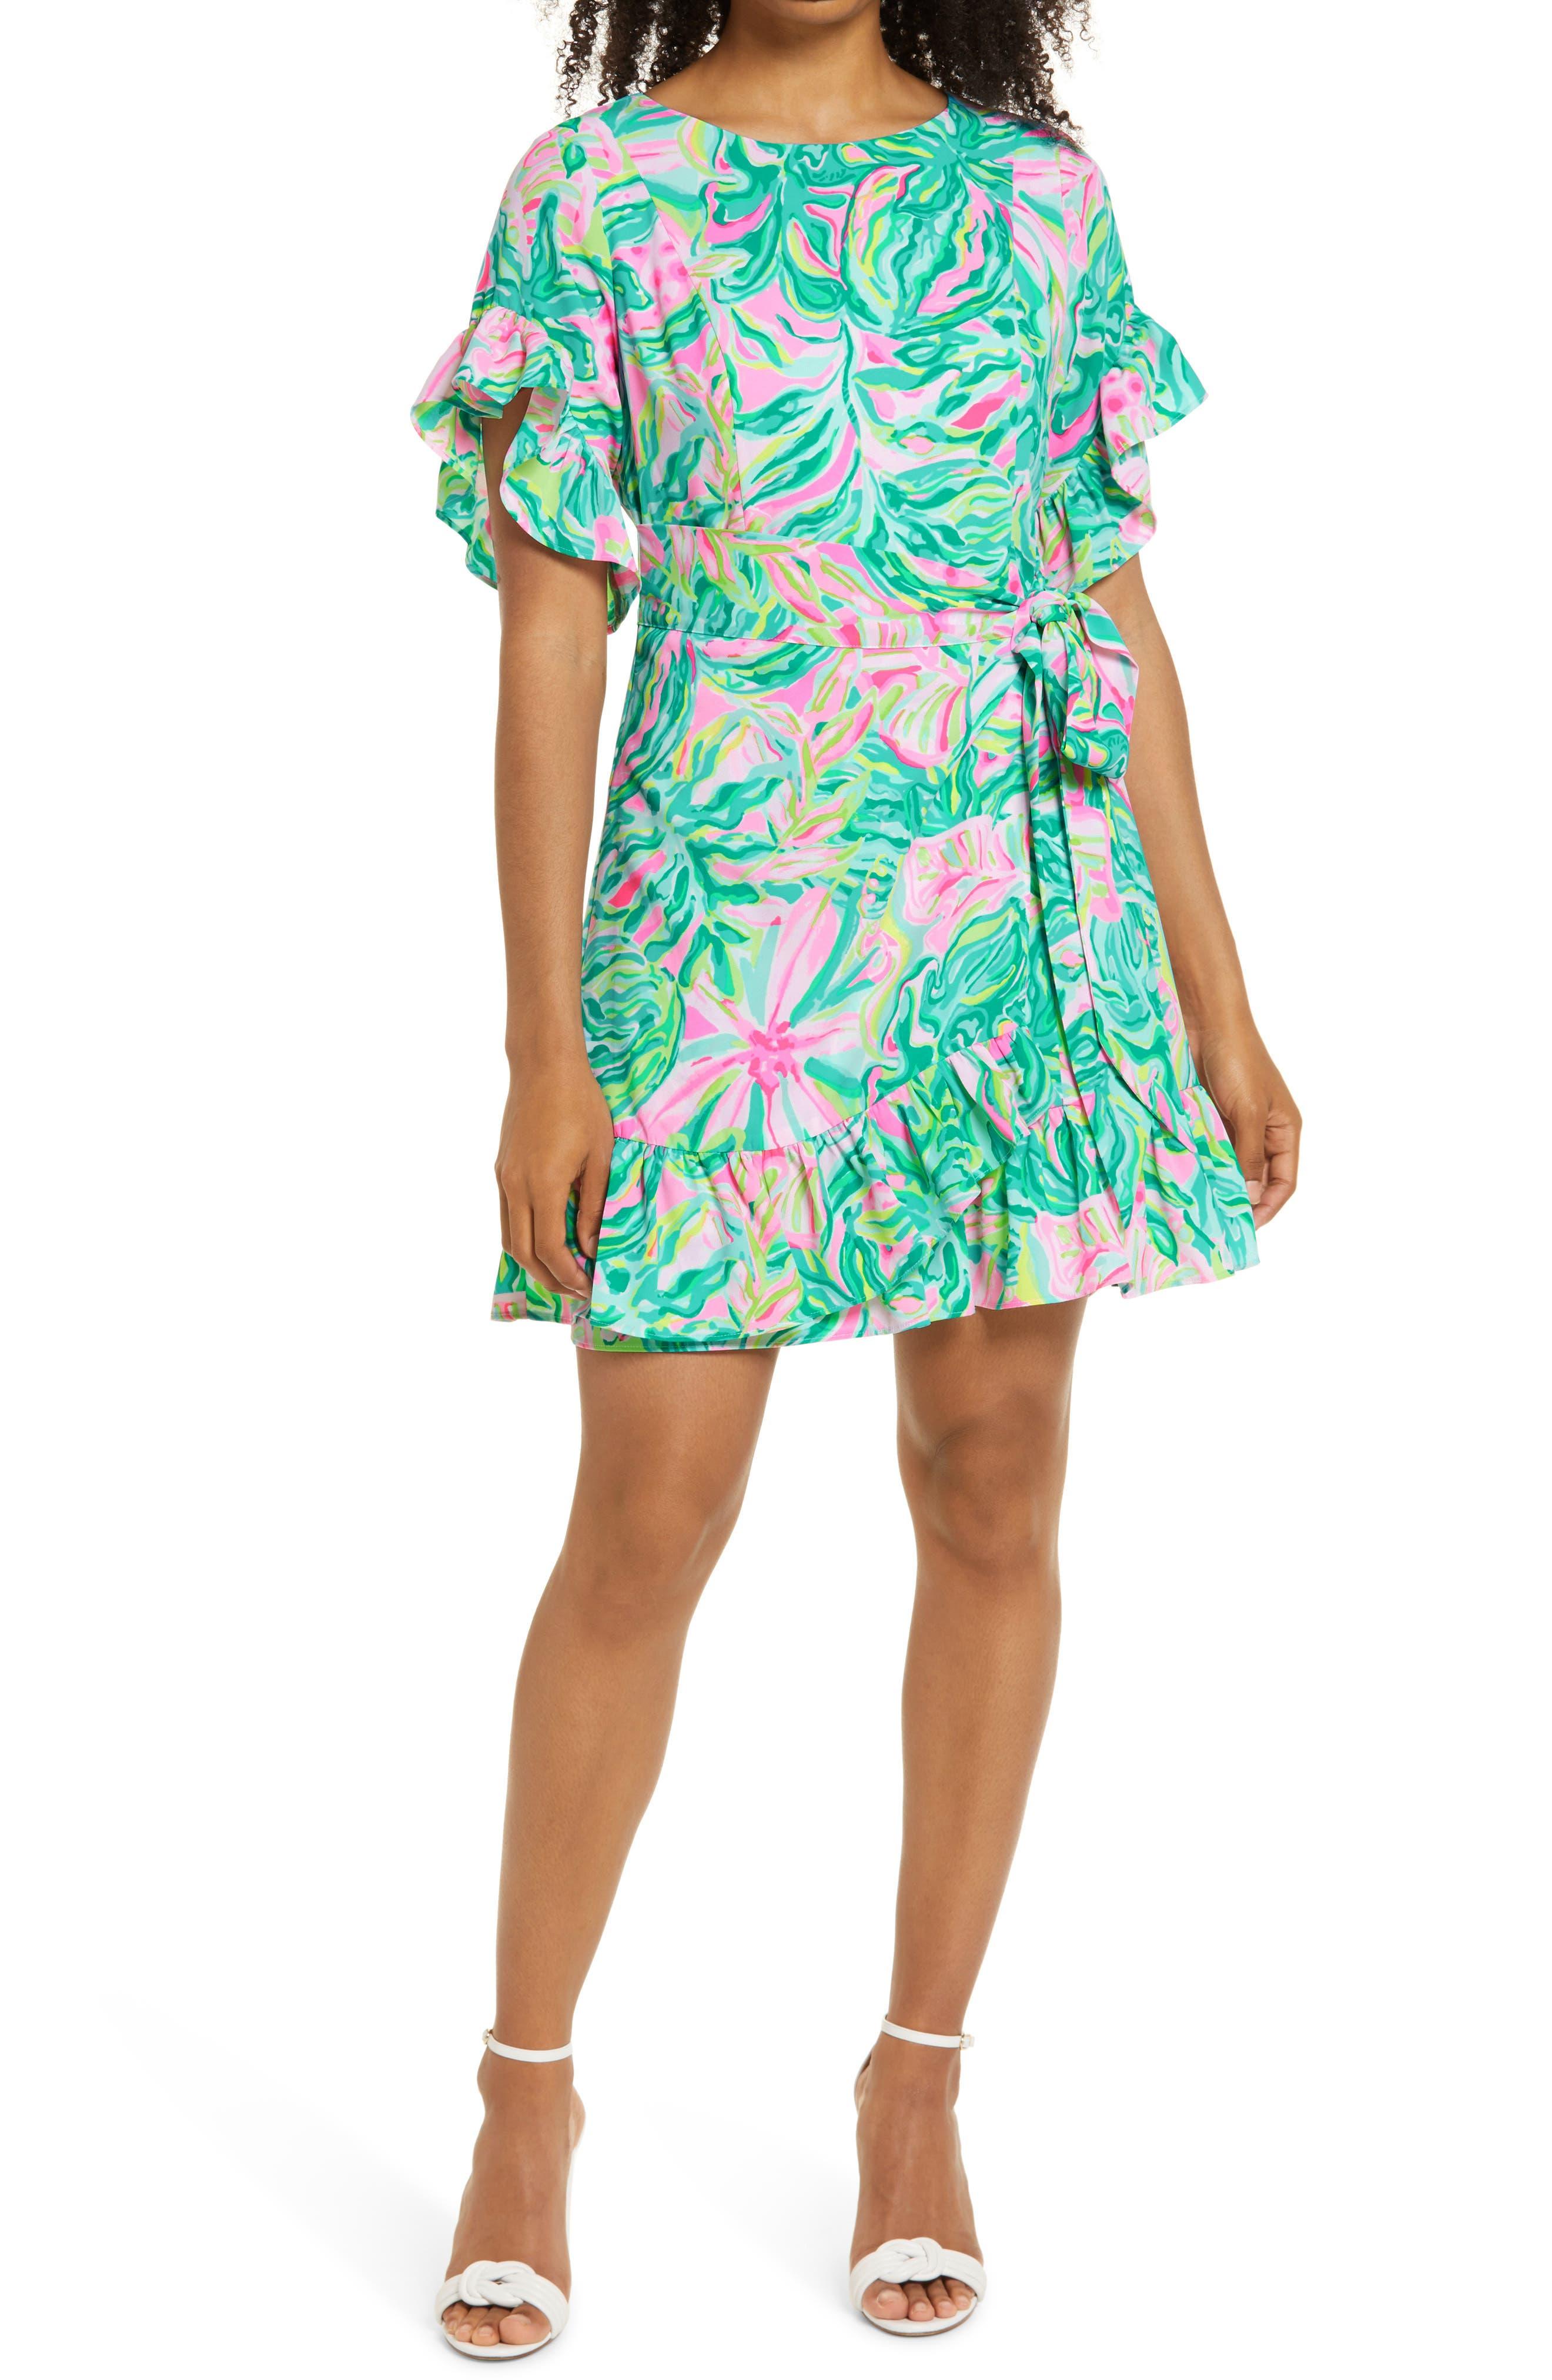 Women's Lilly Pulitzer Darlah Print Ruffle Dress